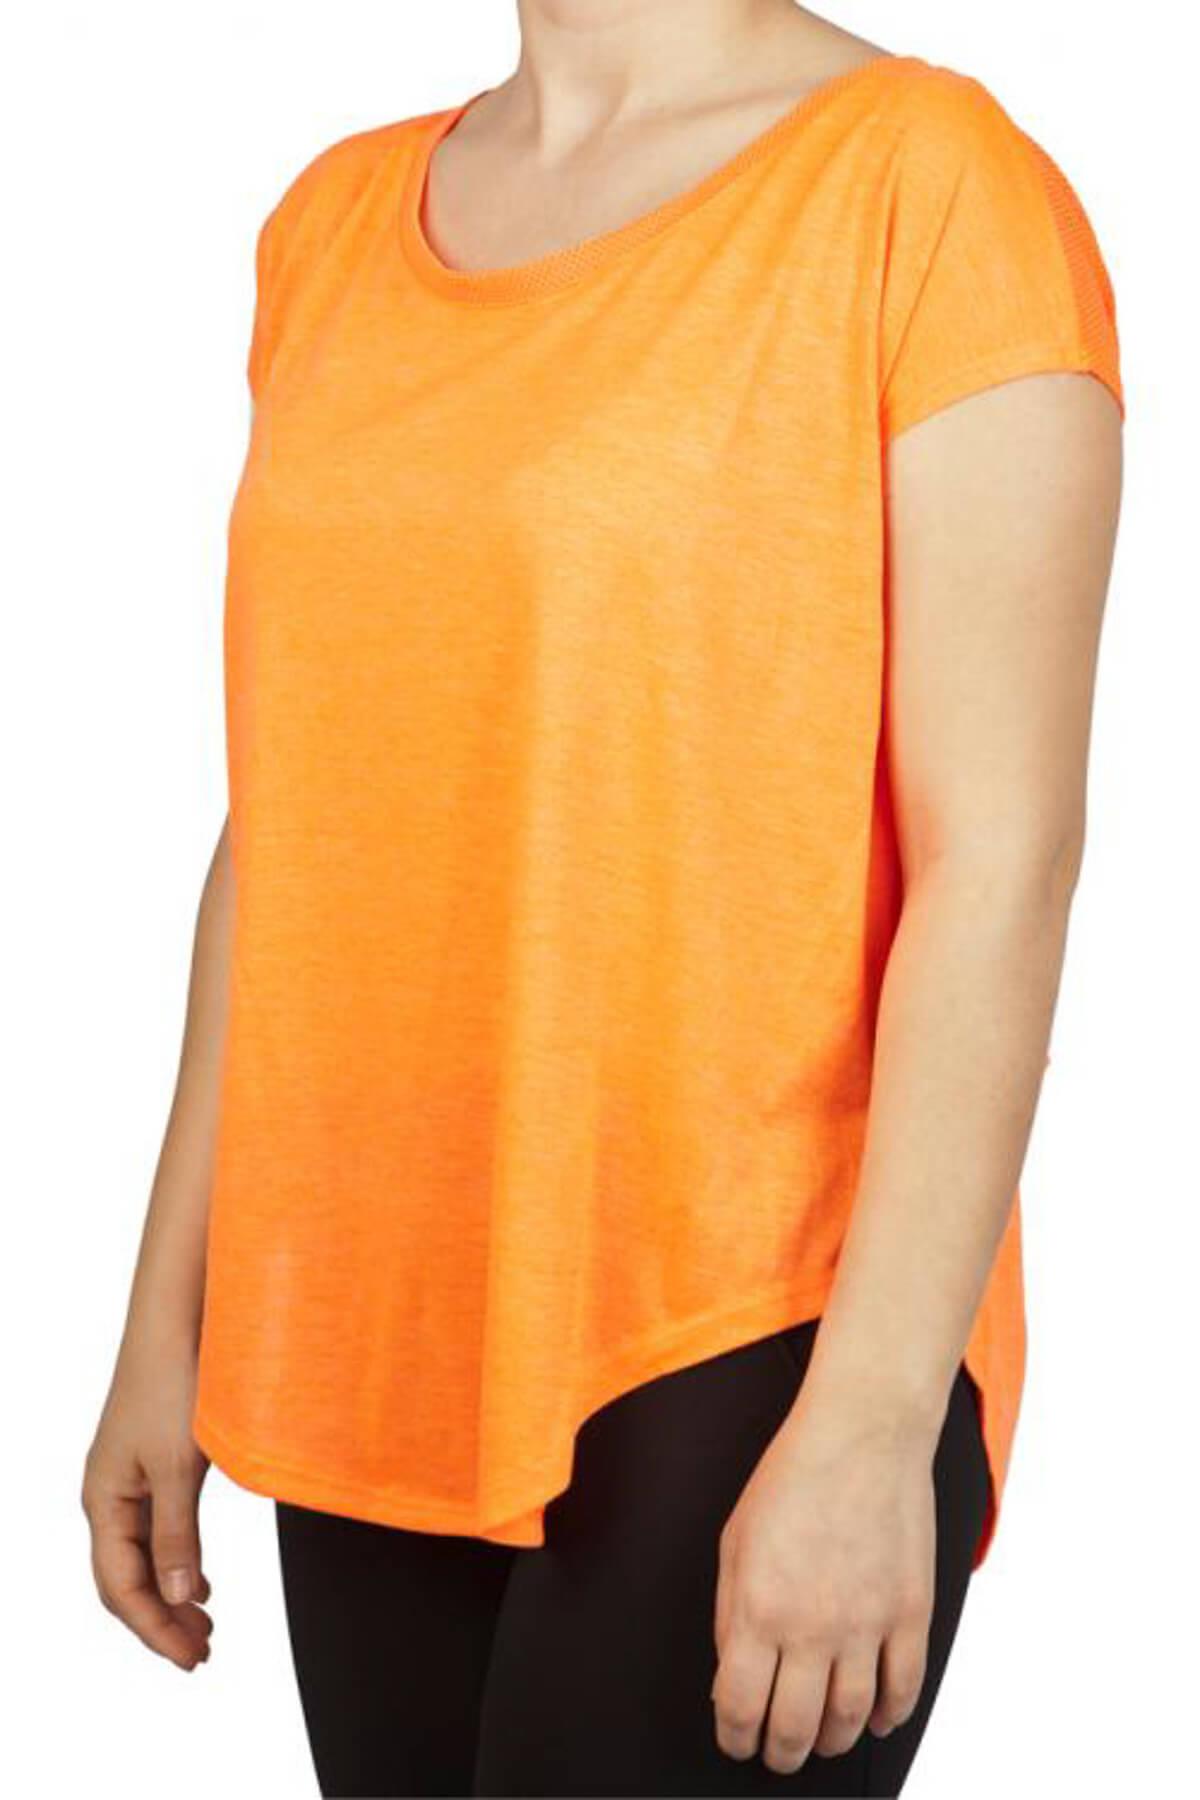 Exuma Kadın T-Shirt - Spor T-Shirt - 362203 1